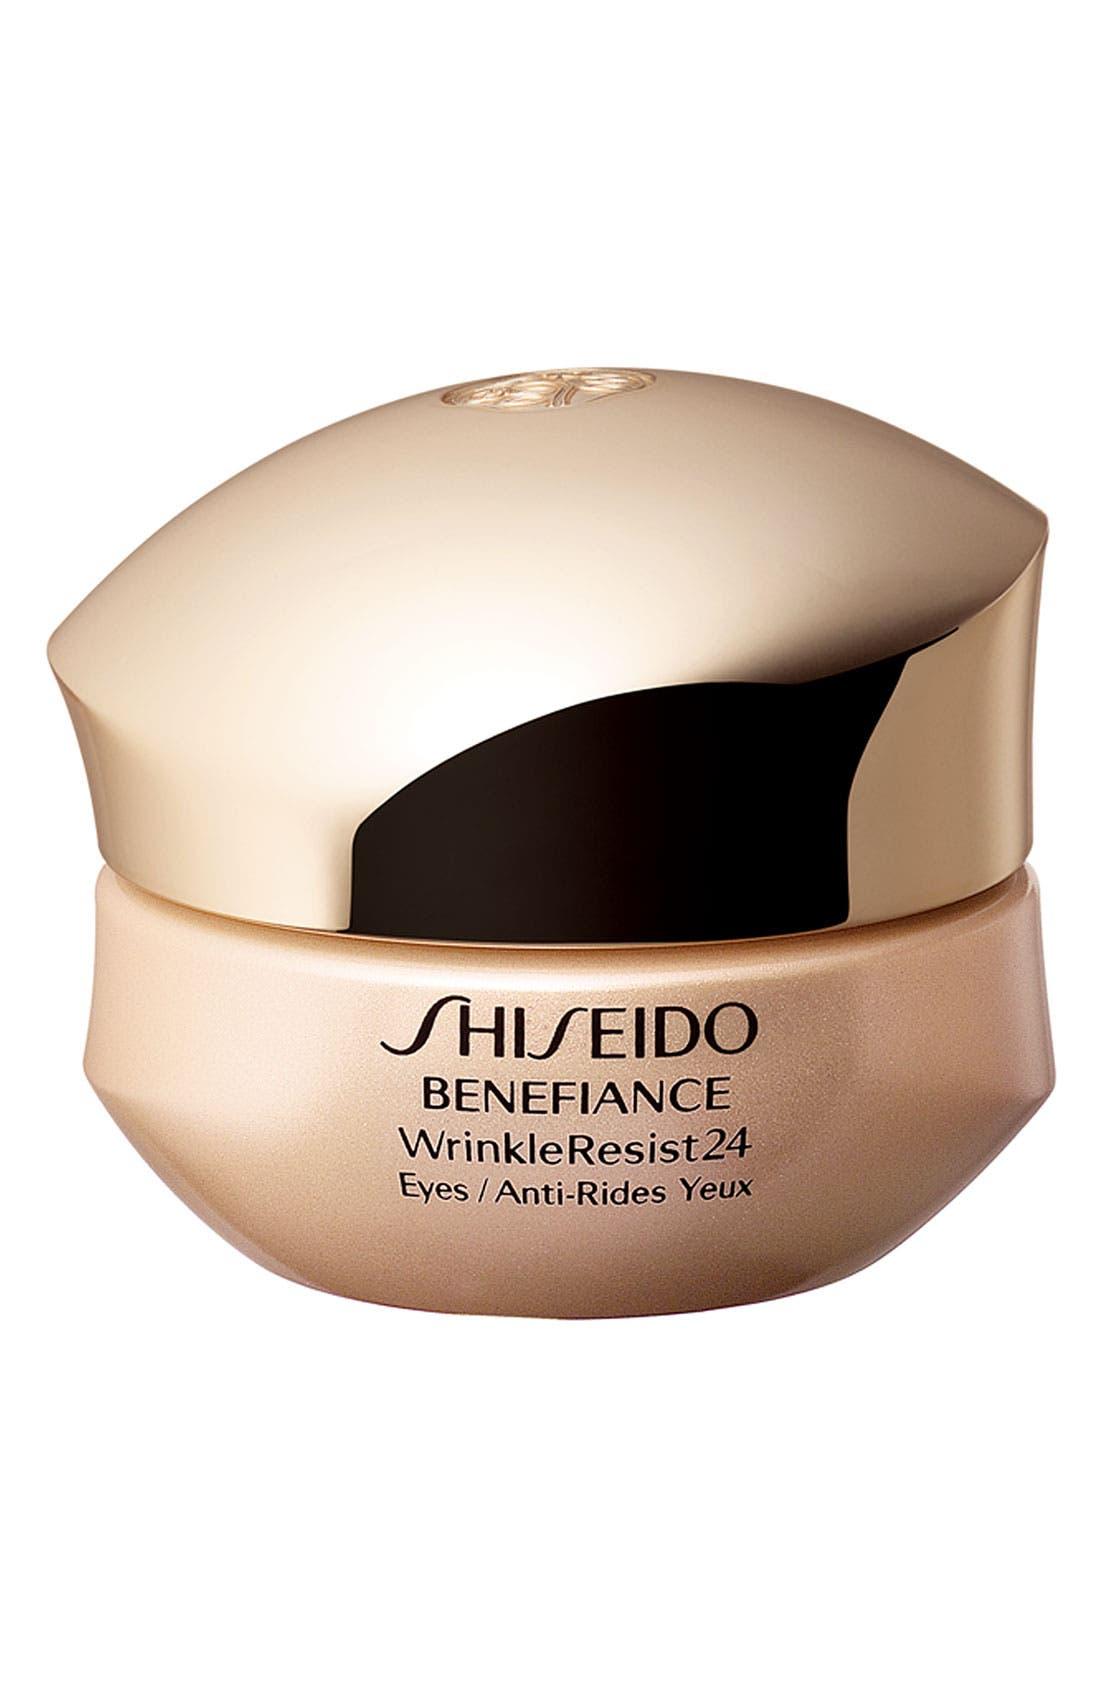 SHISEIDO, Benefiance WrinkleResist24 Intensive Eye Contour Cream, Main thumbnail 1, color, NO COLOR